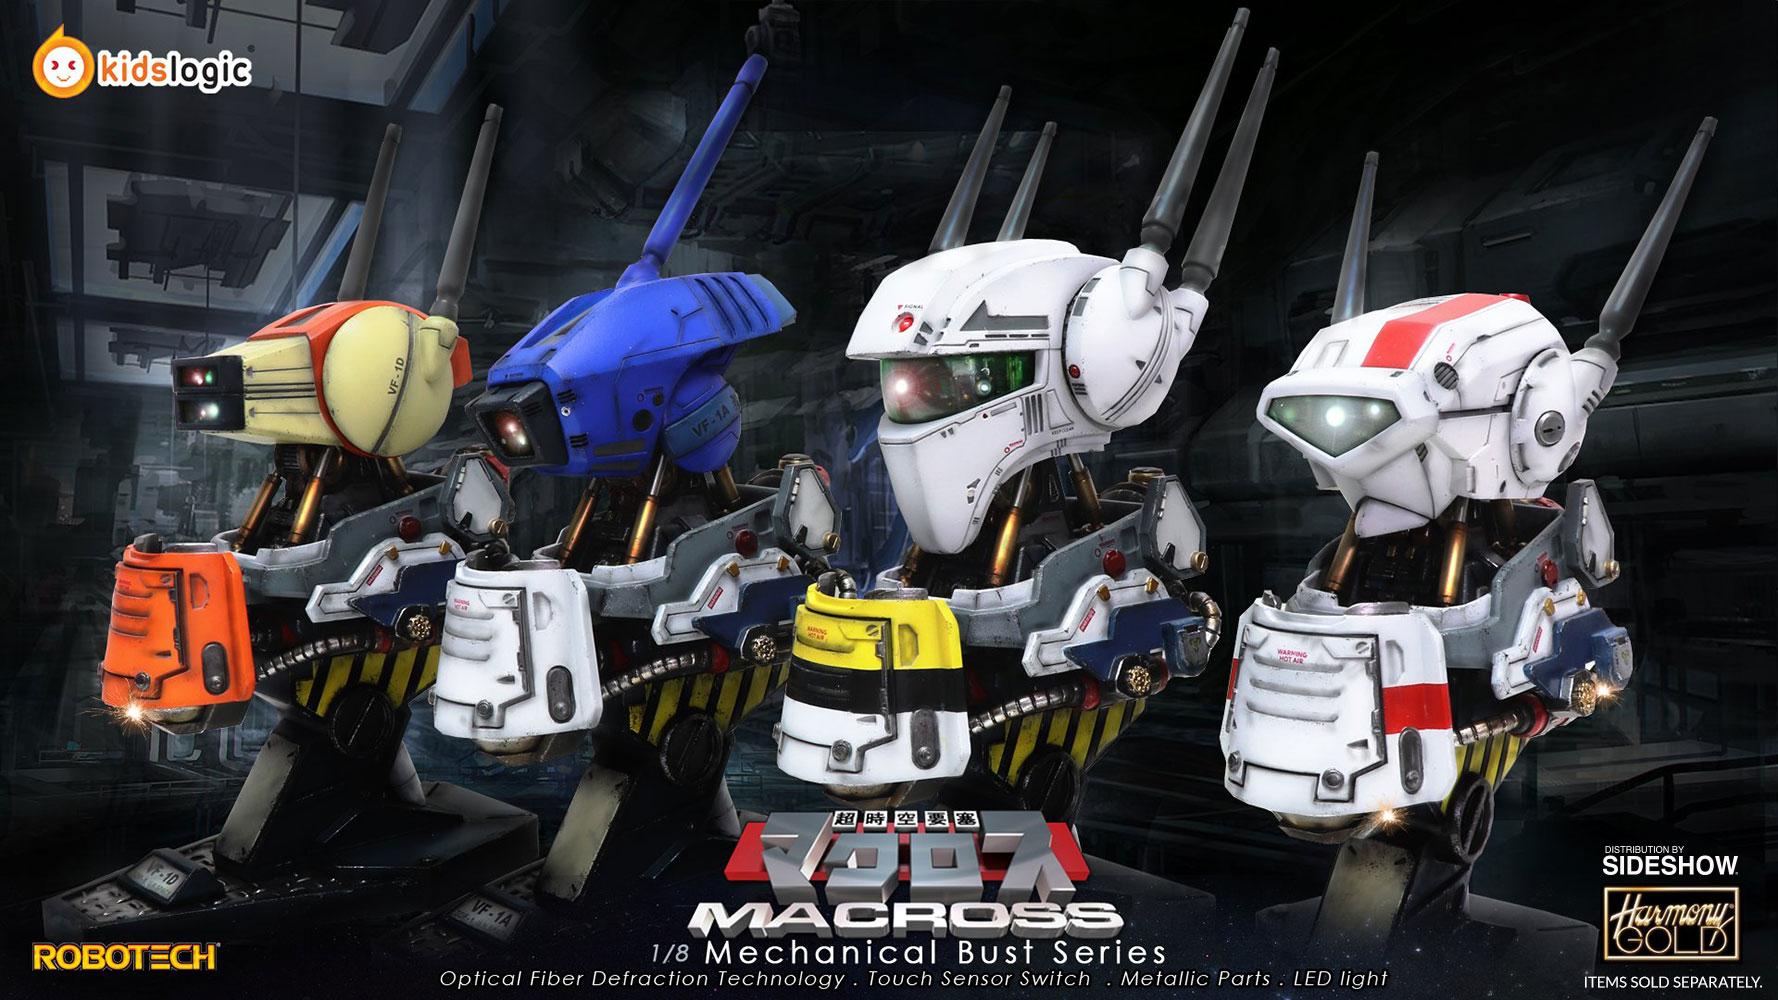 Robots Macross - Page 55 8lvdyyka_o